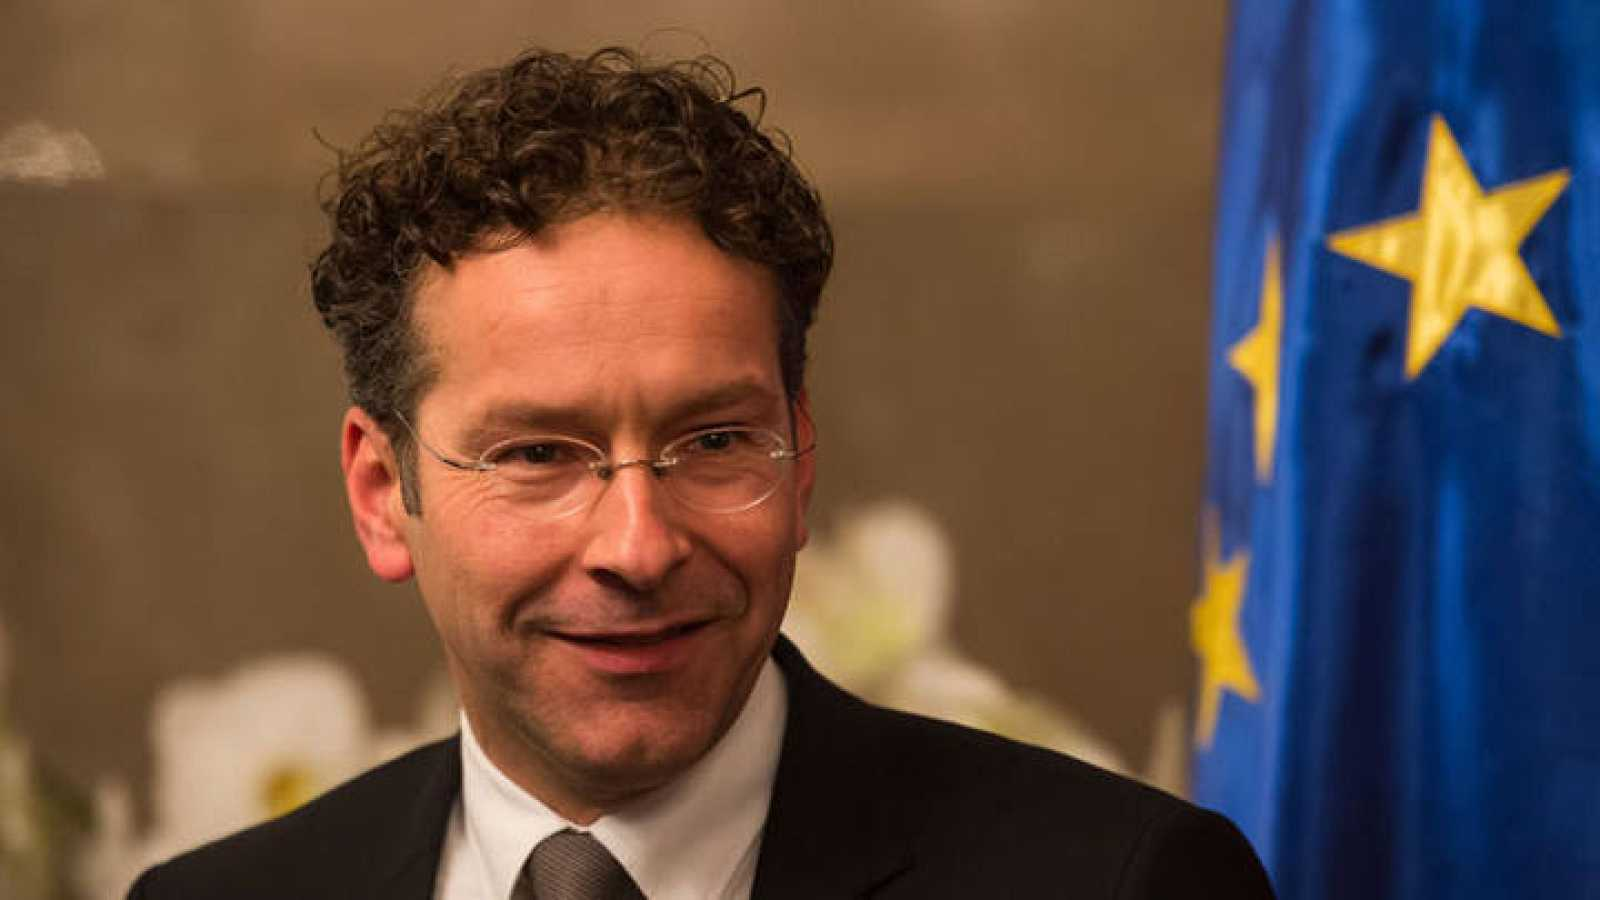 El presidente del Eurogrupo, Jeroen Dijsselbloem, en una imagen de archivo.